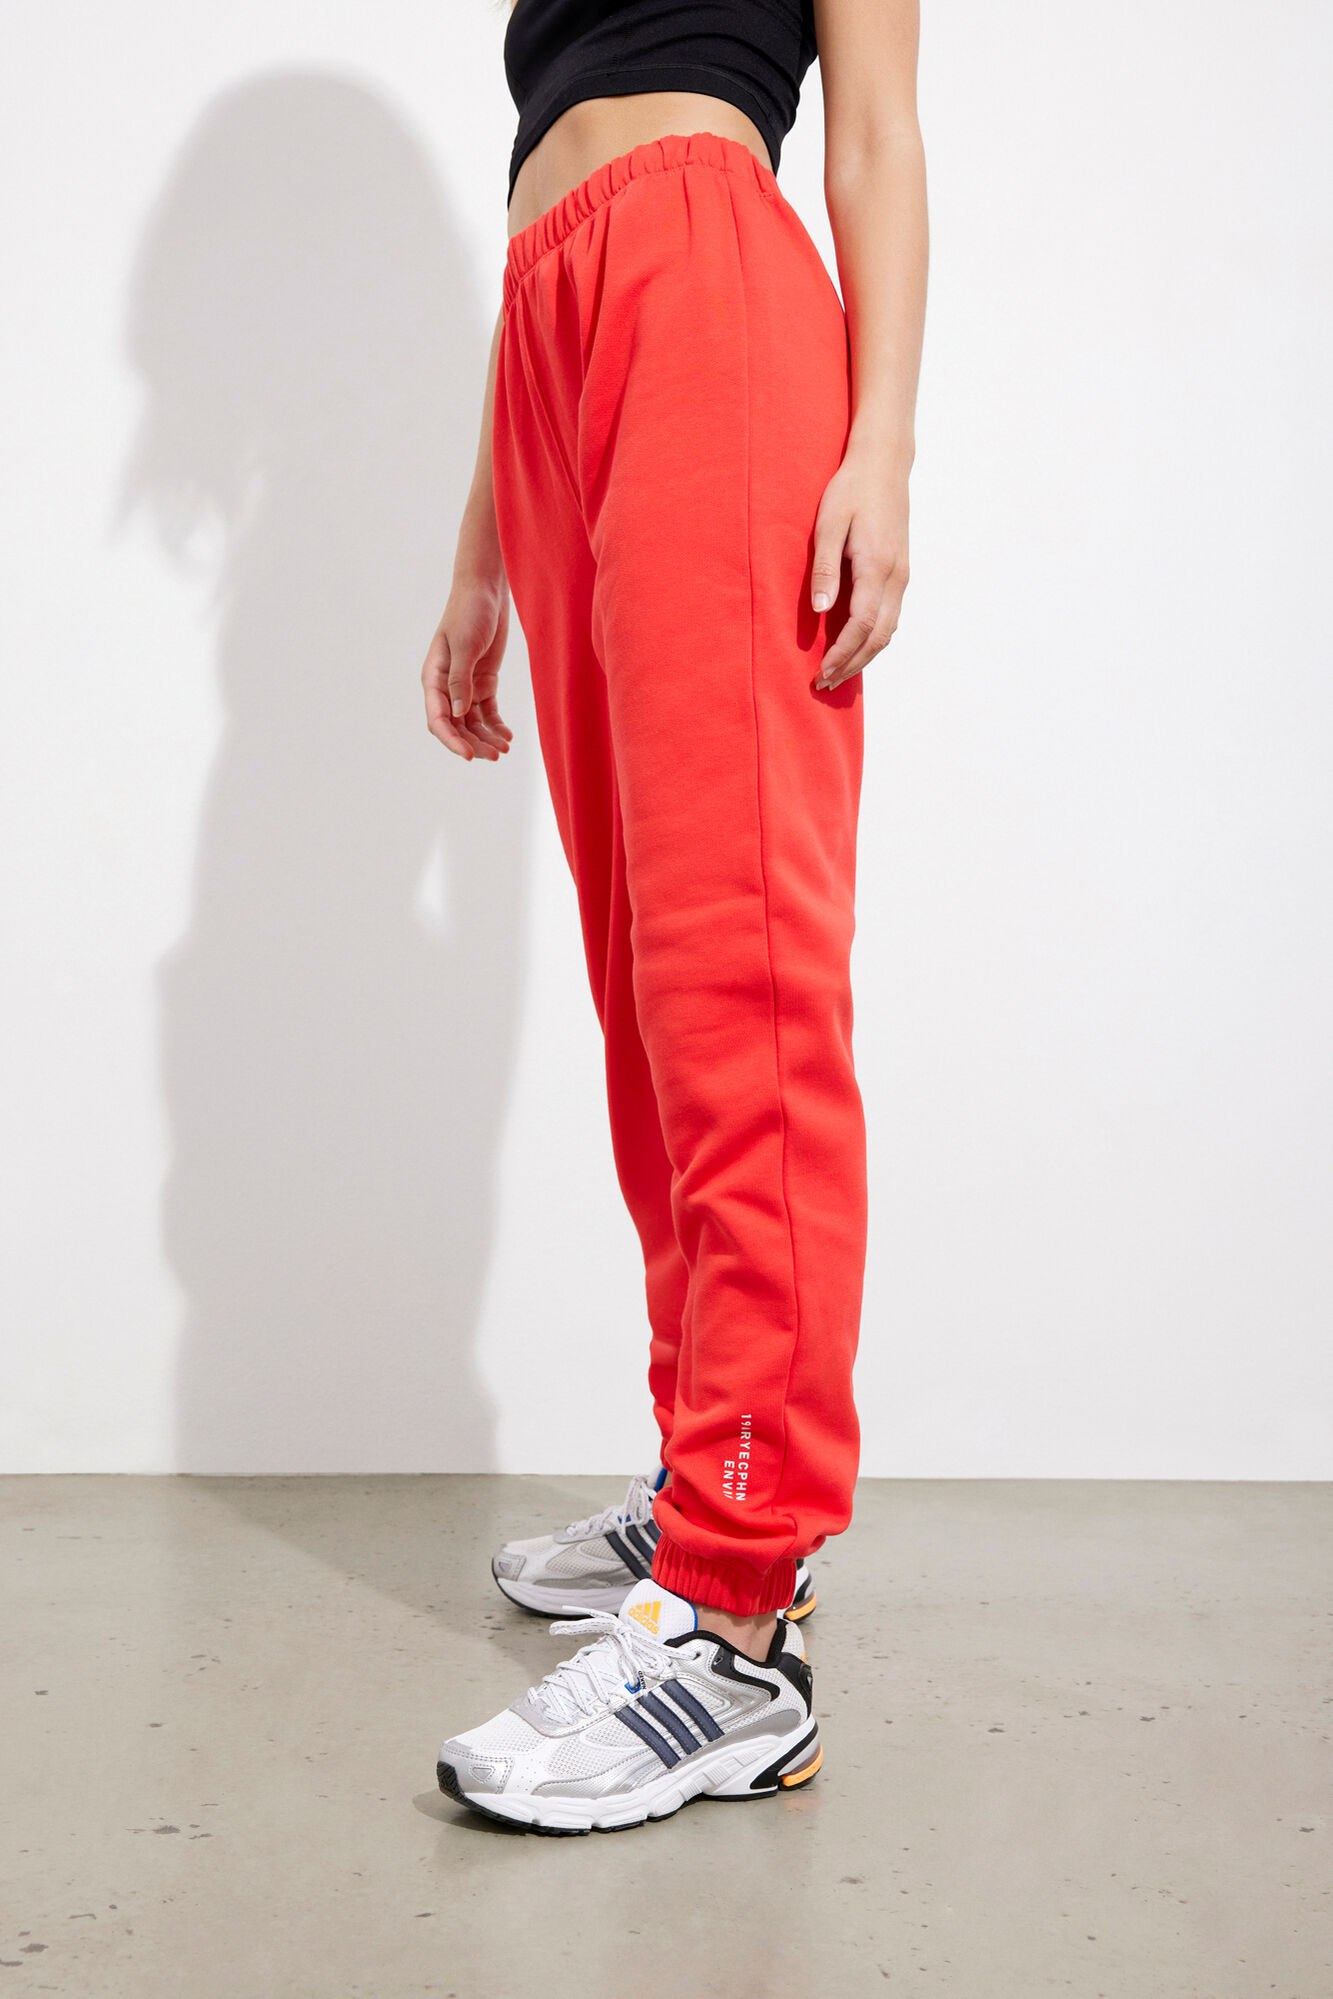 ENMONROE PANTS LOGO 5304, HIGH RISK RED